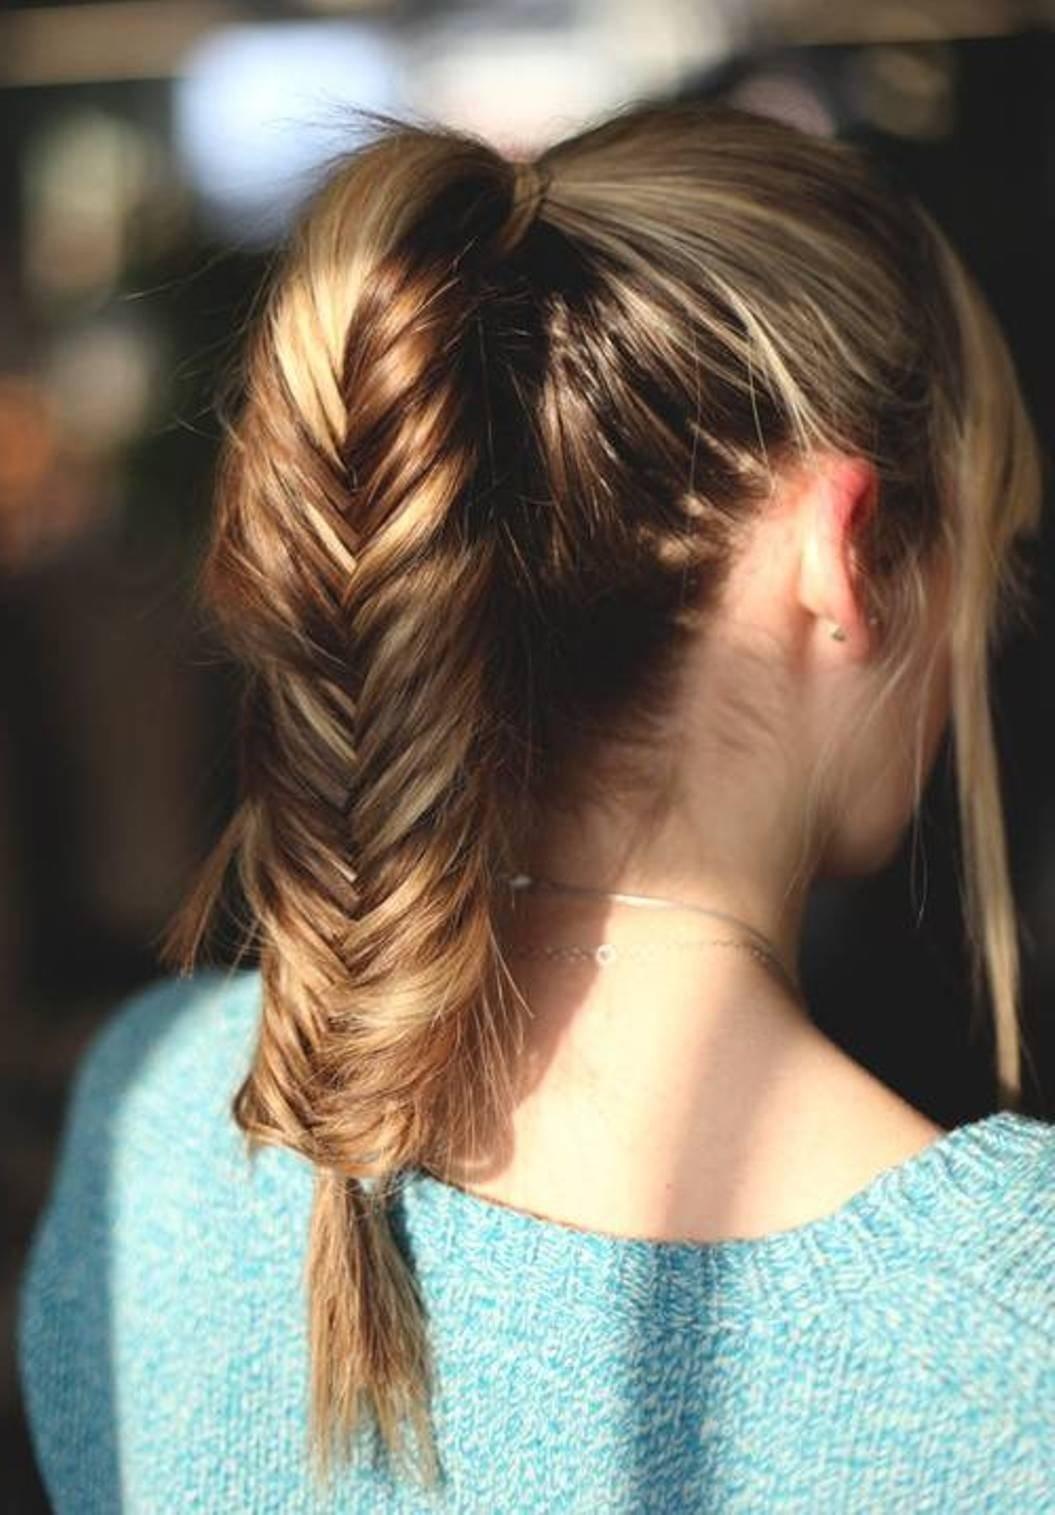 10 Fantastic Cute Ponytail Ideas For Medium Hair medium length ponytail hairstyles hairstyle for women man 2020